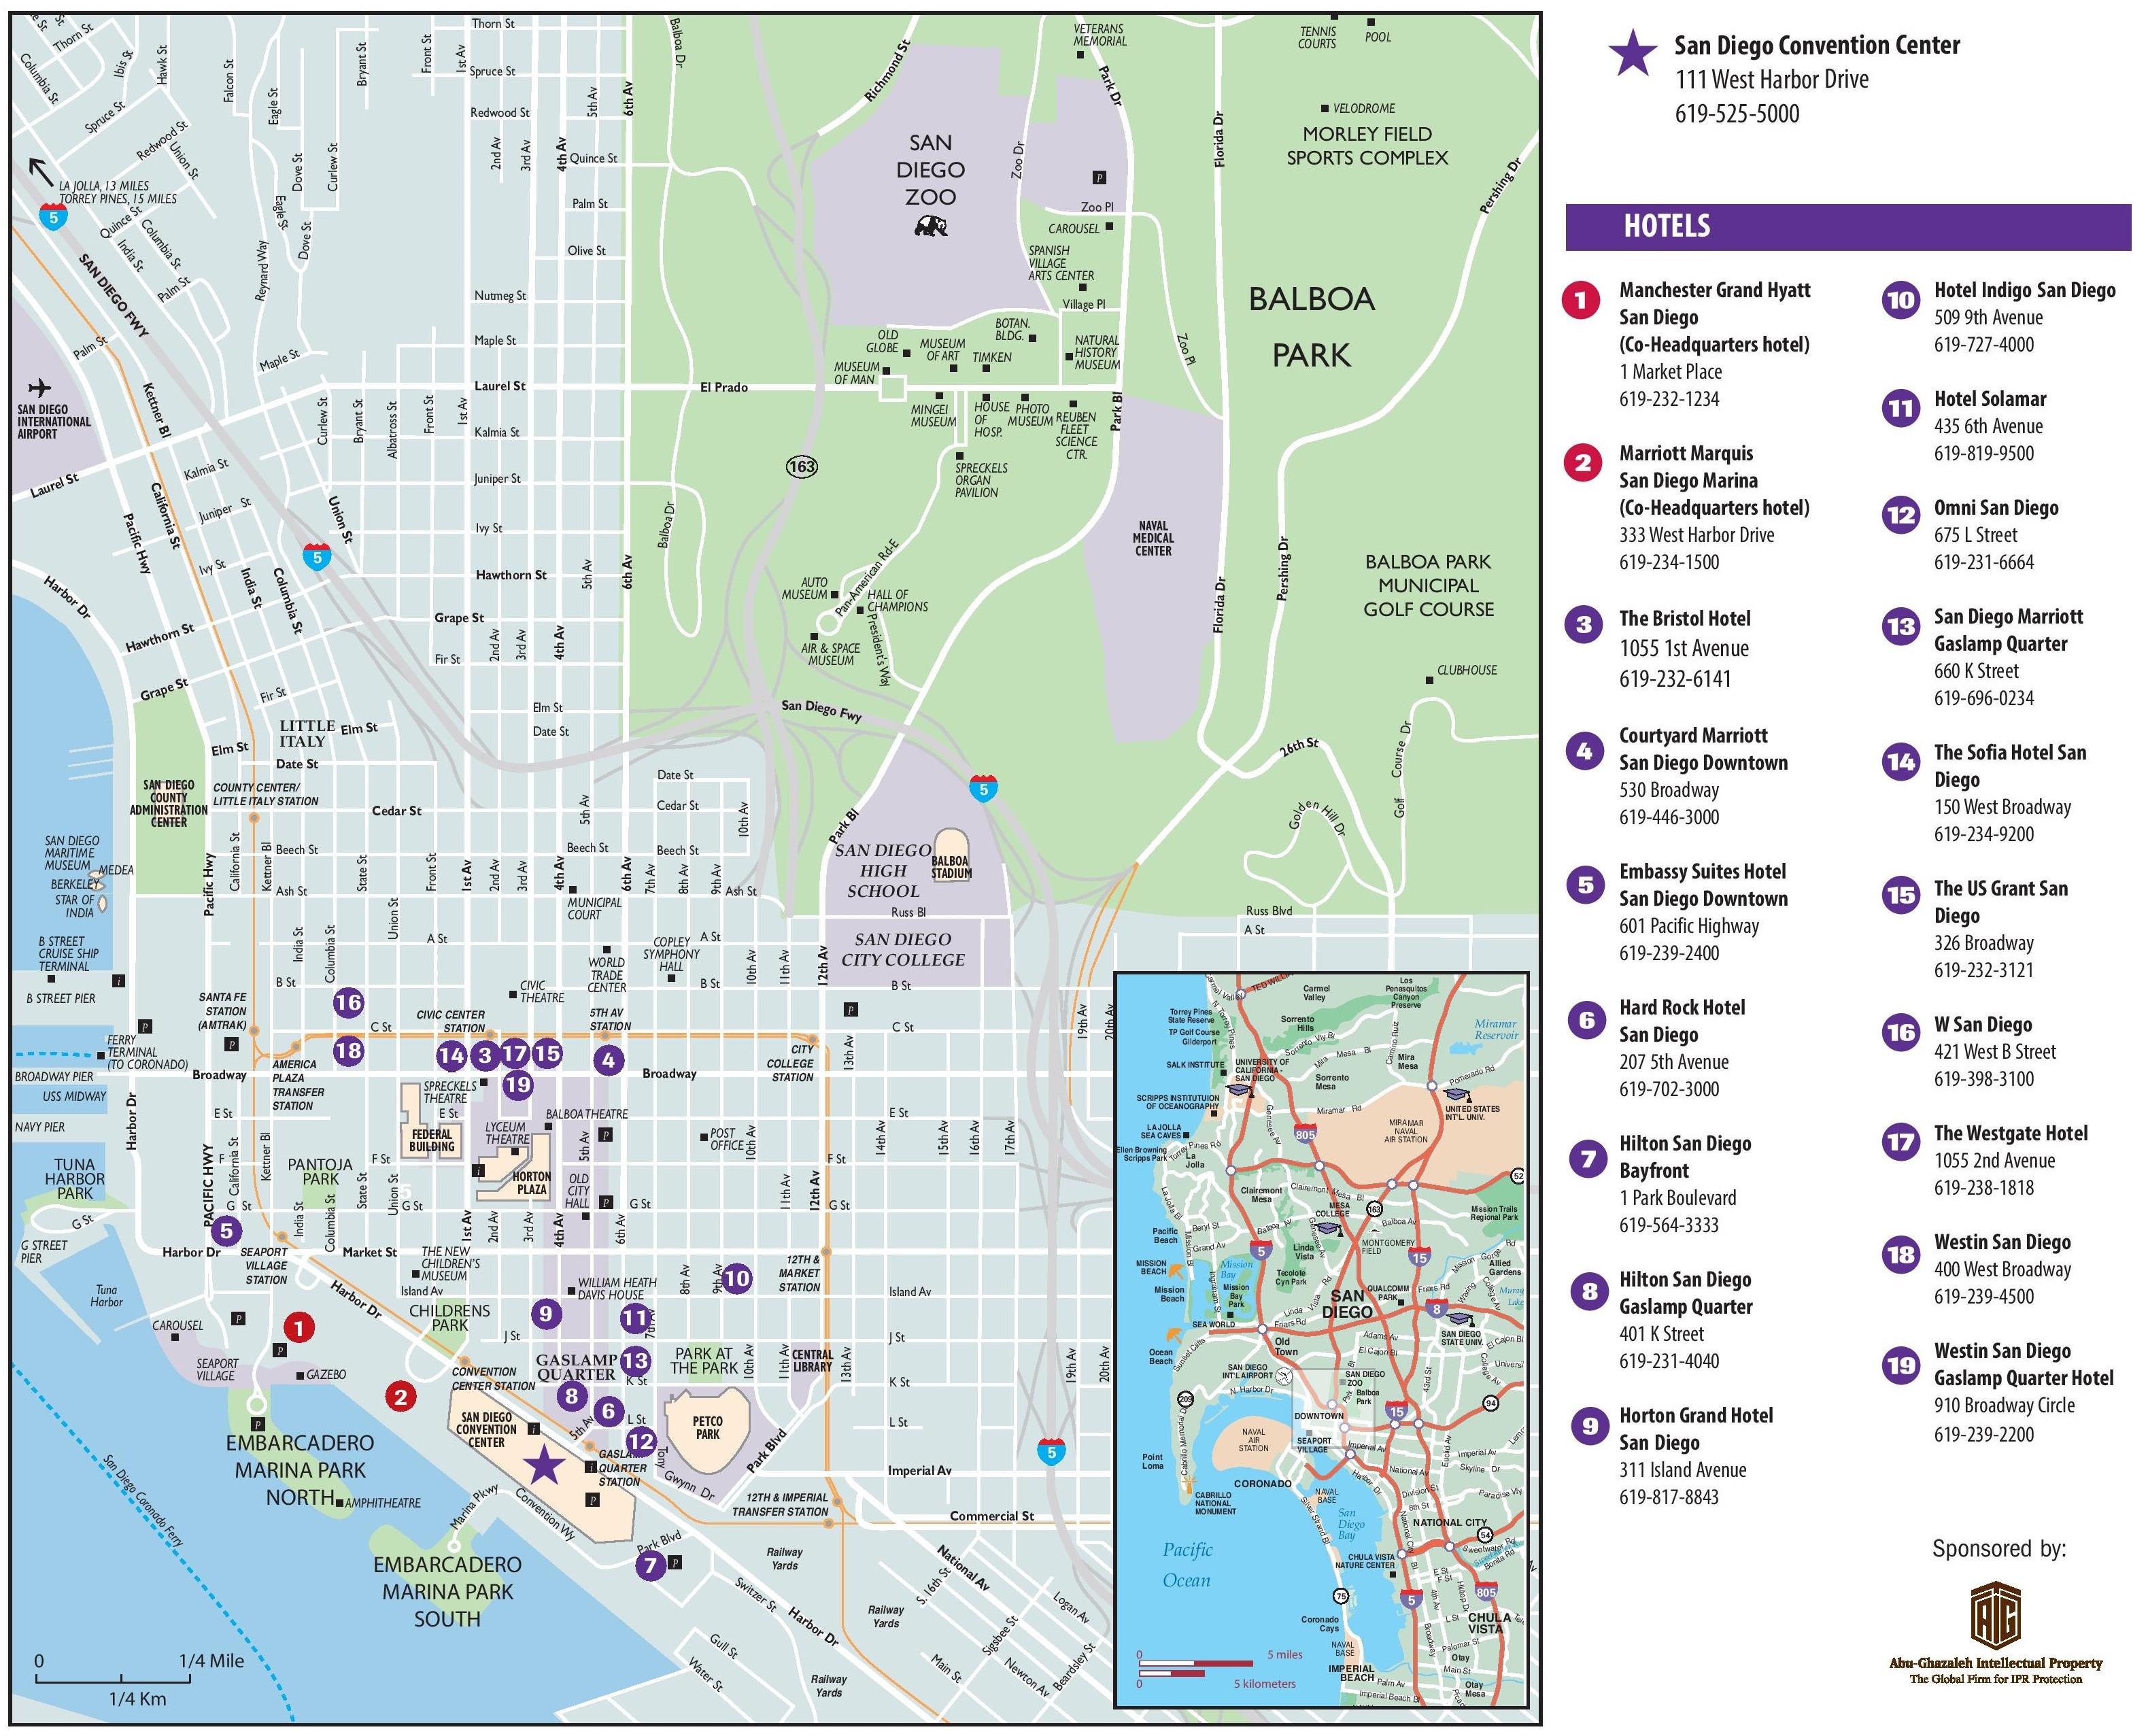 Northern California Casino Map Printable San Diego Casinos Map 100 - Casinos In California Map